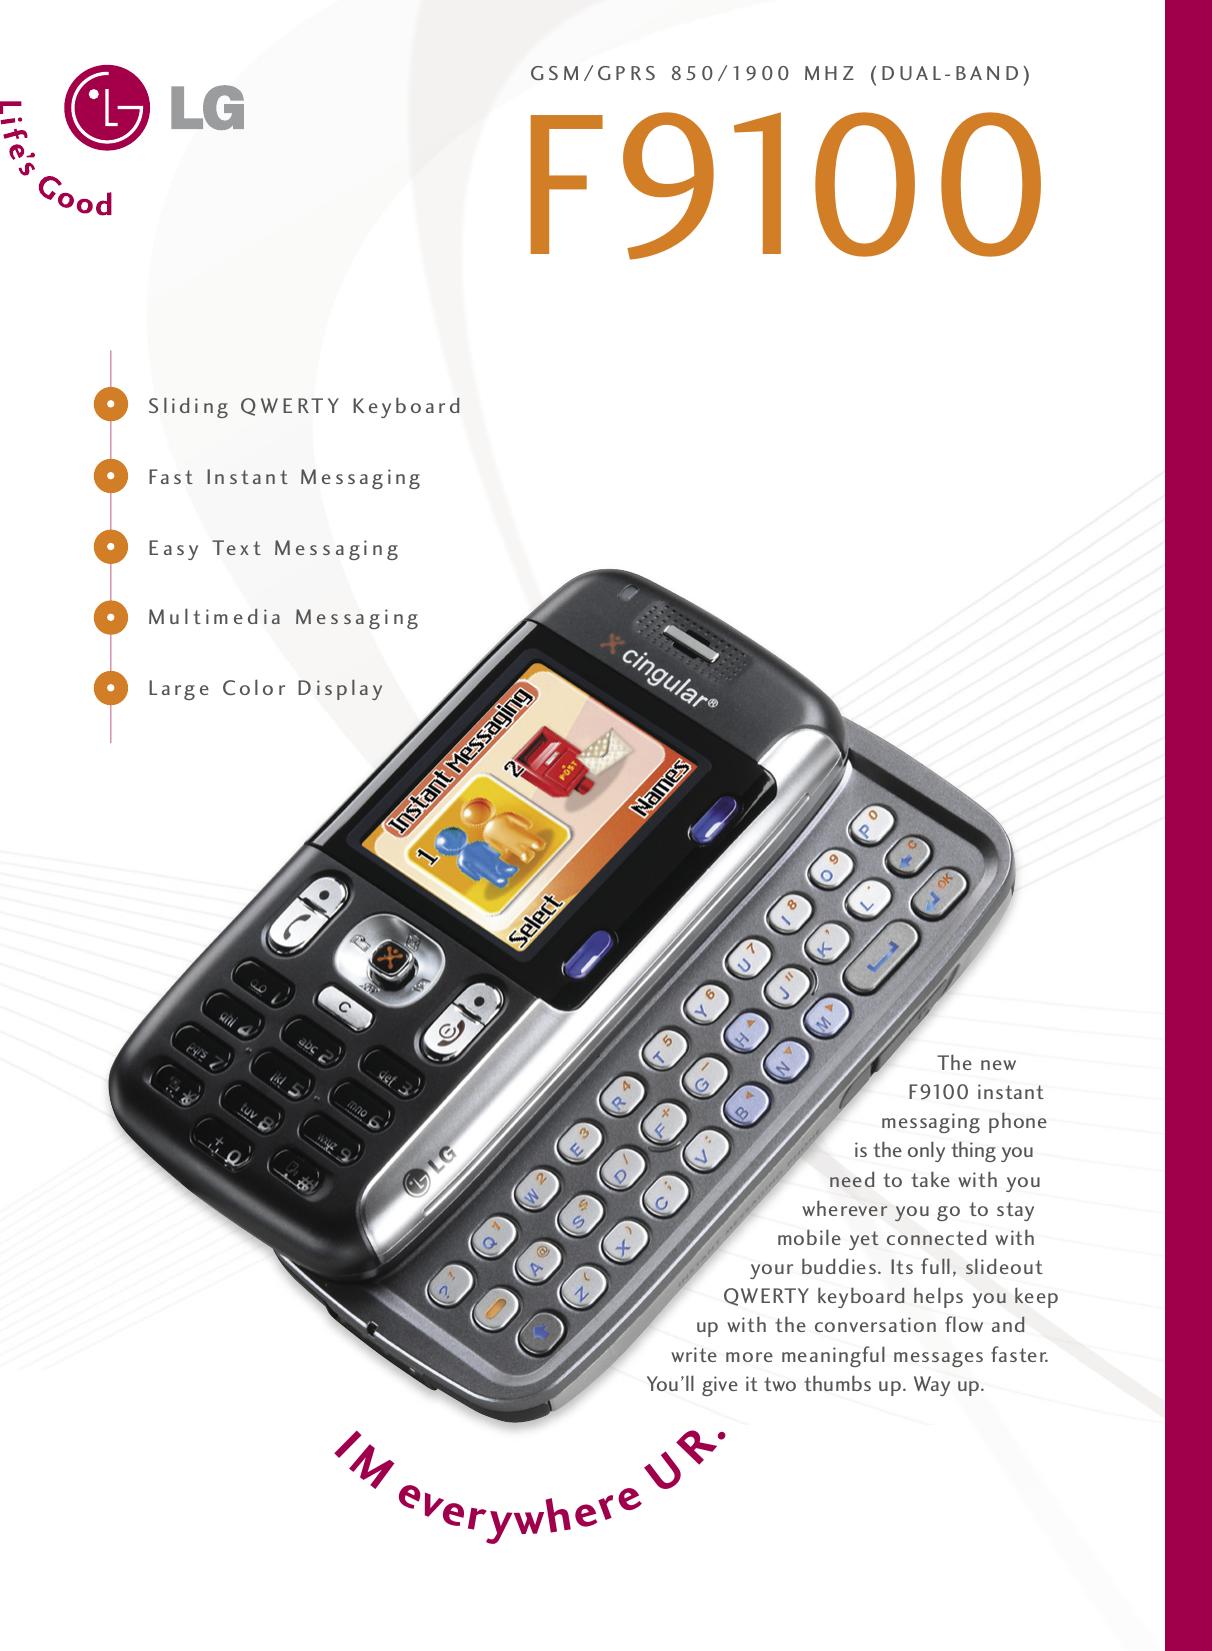 lg f9100 cingular datasheet user manual data sheet rh usermanual wiki LG C1200 LG C1500